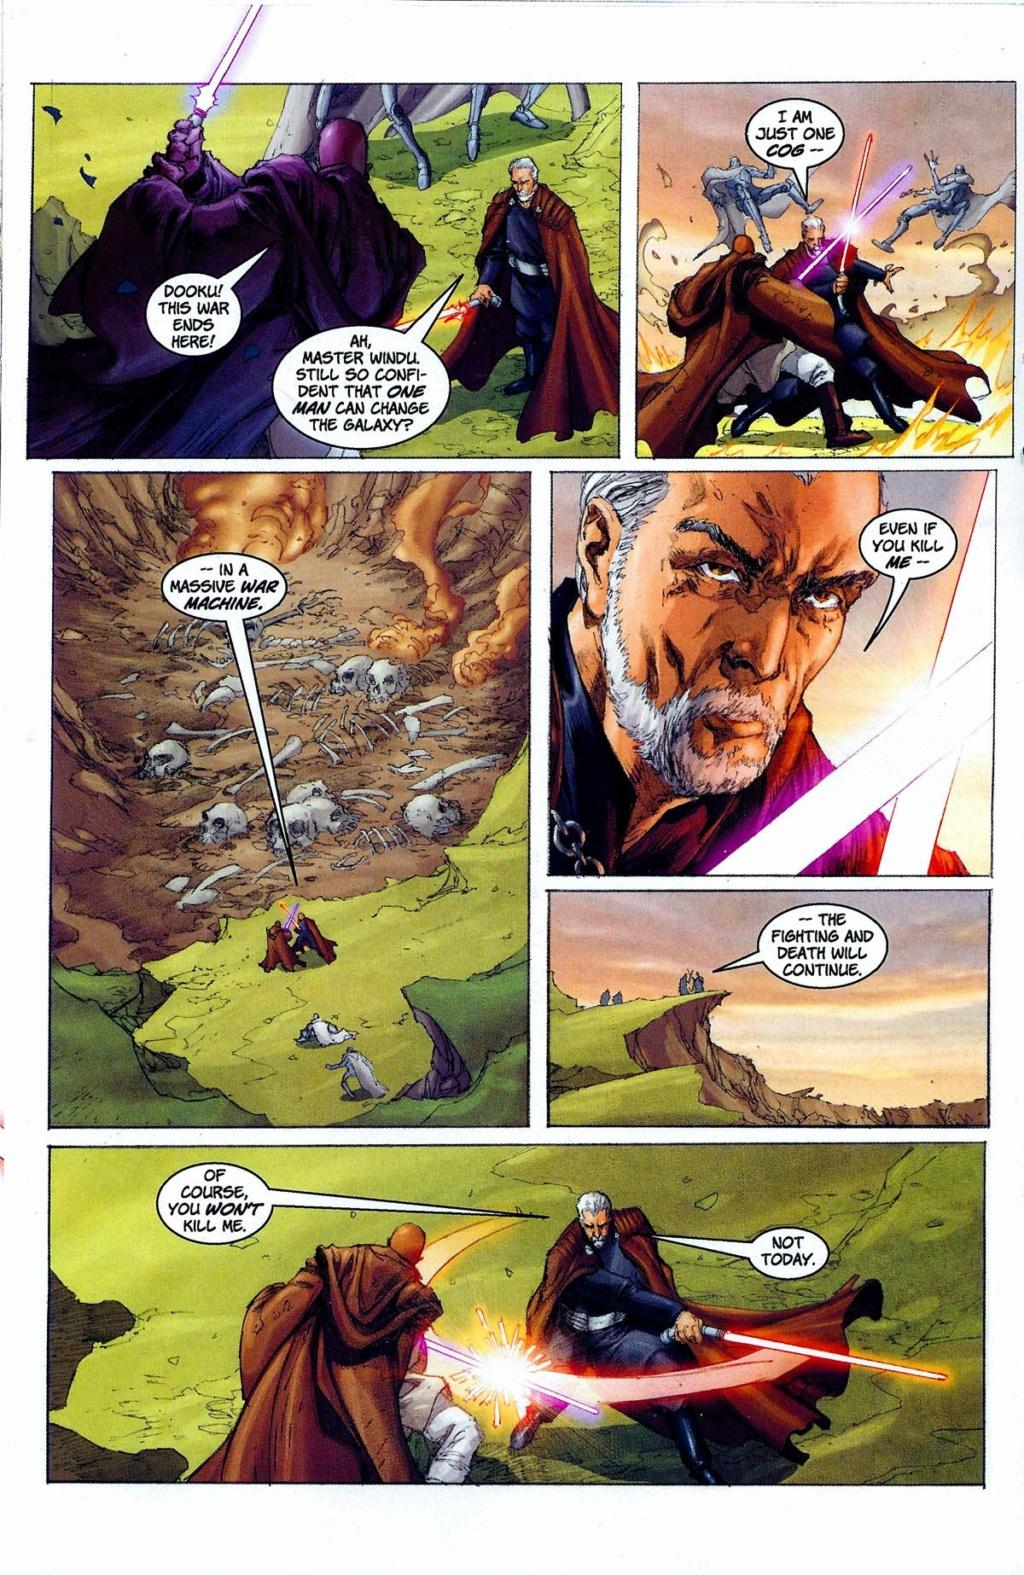 SS - Mace Windu (KnightfallVader / alex s) vs Darth Tyranus (Darth Dorin's Baneling)  A9613812